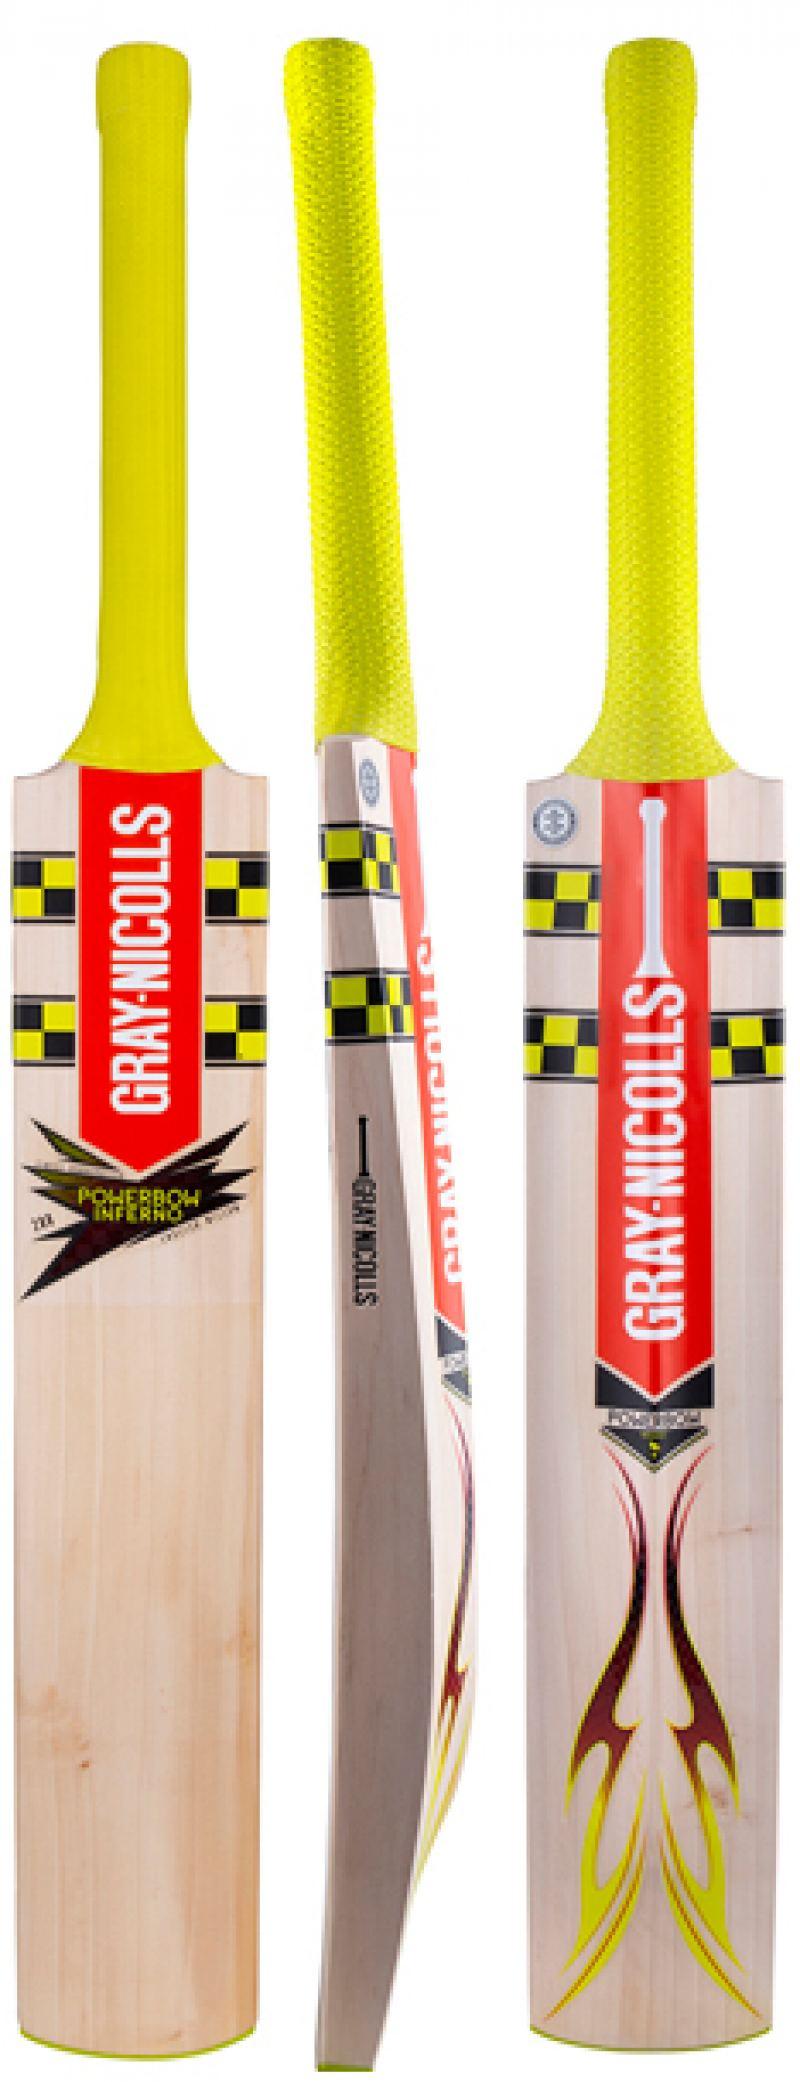 Gray Nicolls Powerbow Inferno 200 Cricket Bat